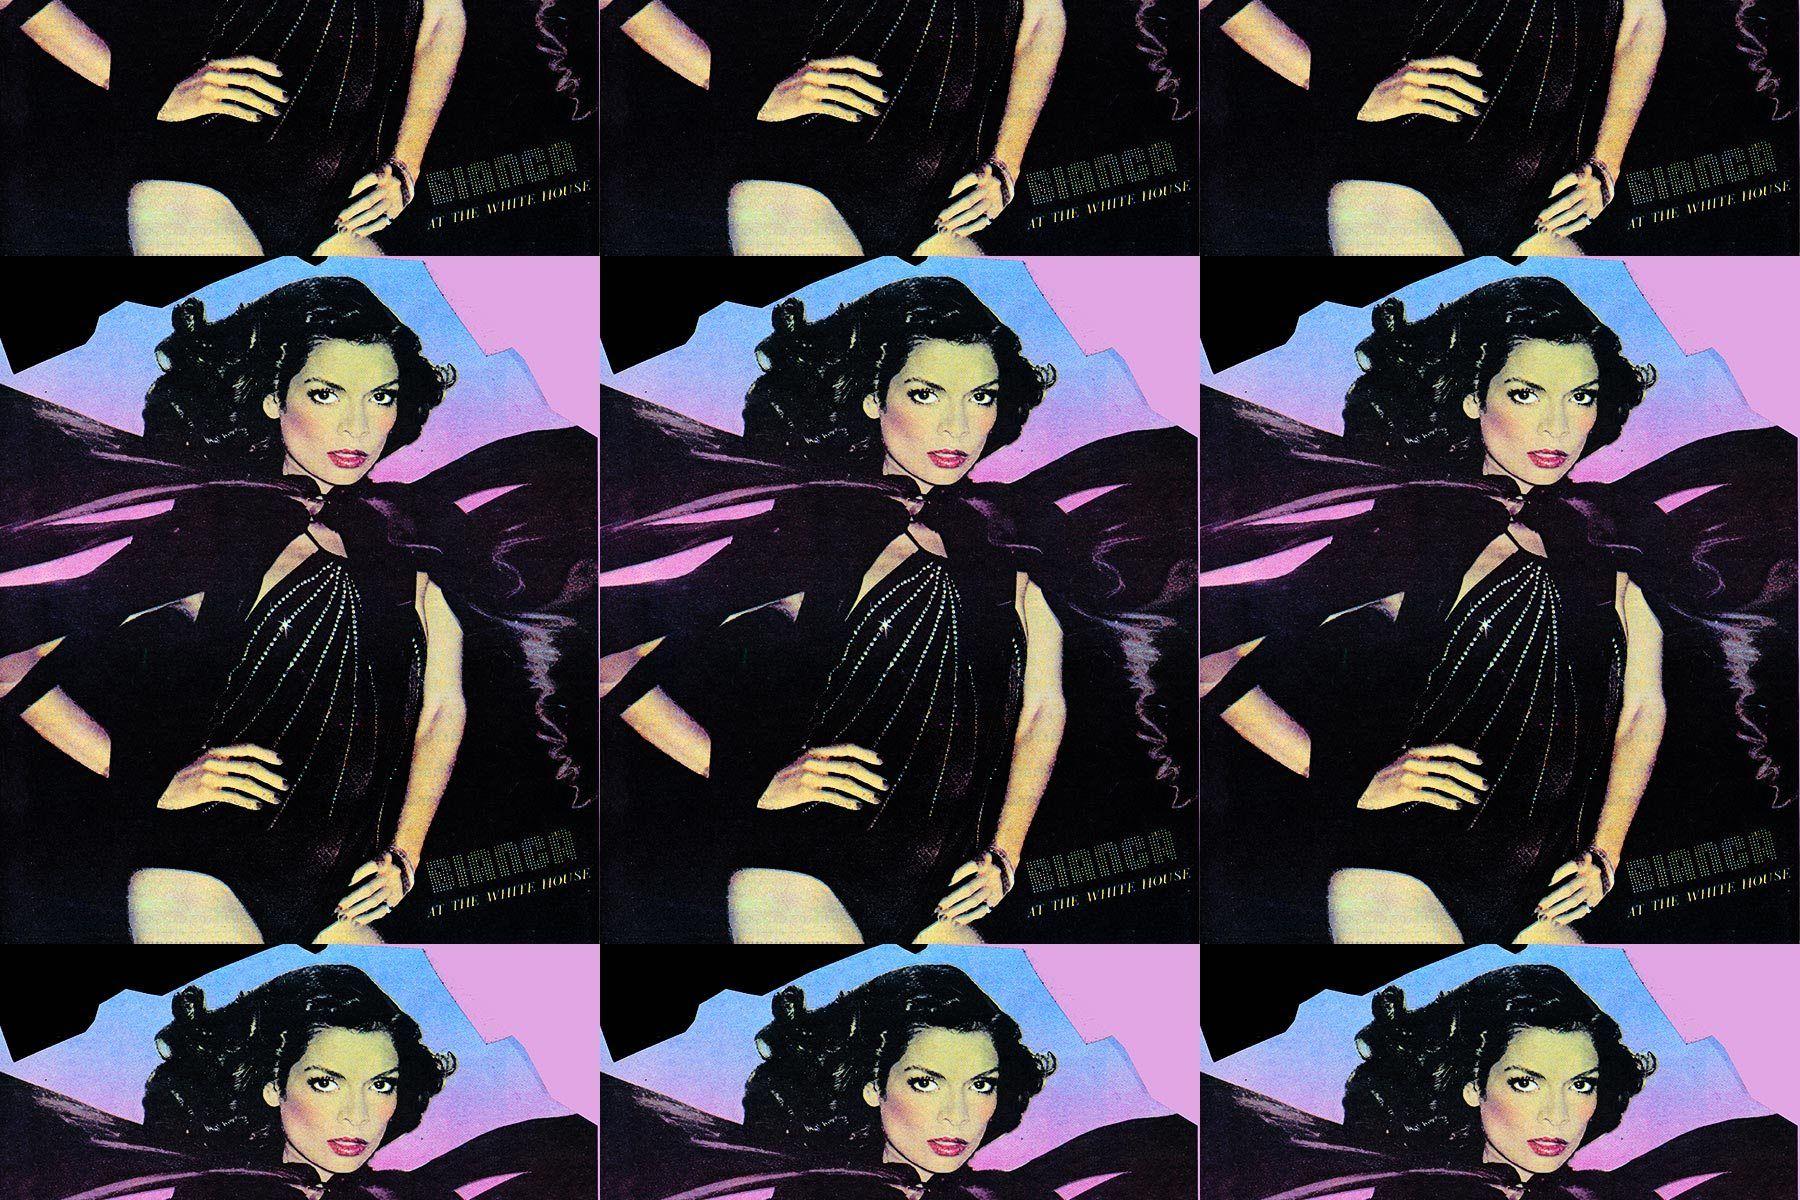 Bianca Jagger by Richard Bernstein; Starmaker by Roger Padhila & Mauricio Padhila. Rizzoli Books. Ponyboy magazine.